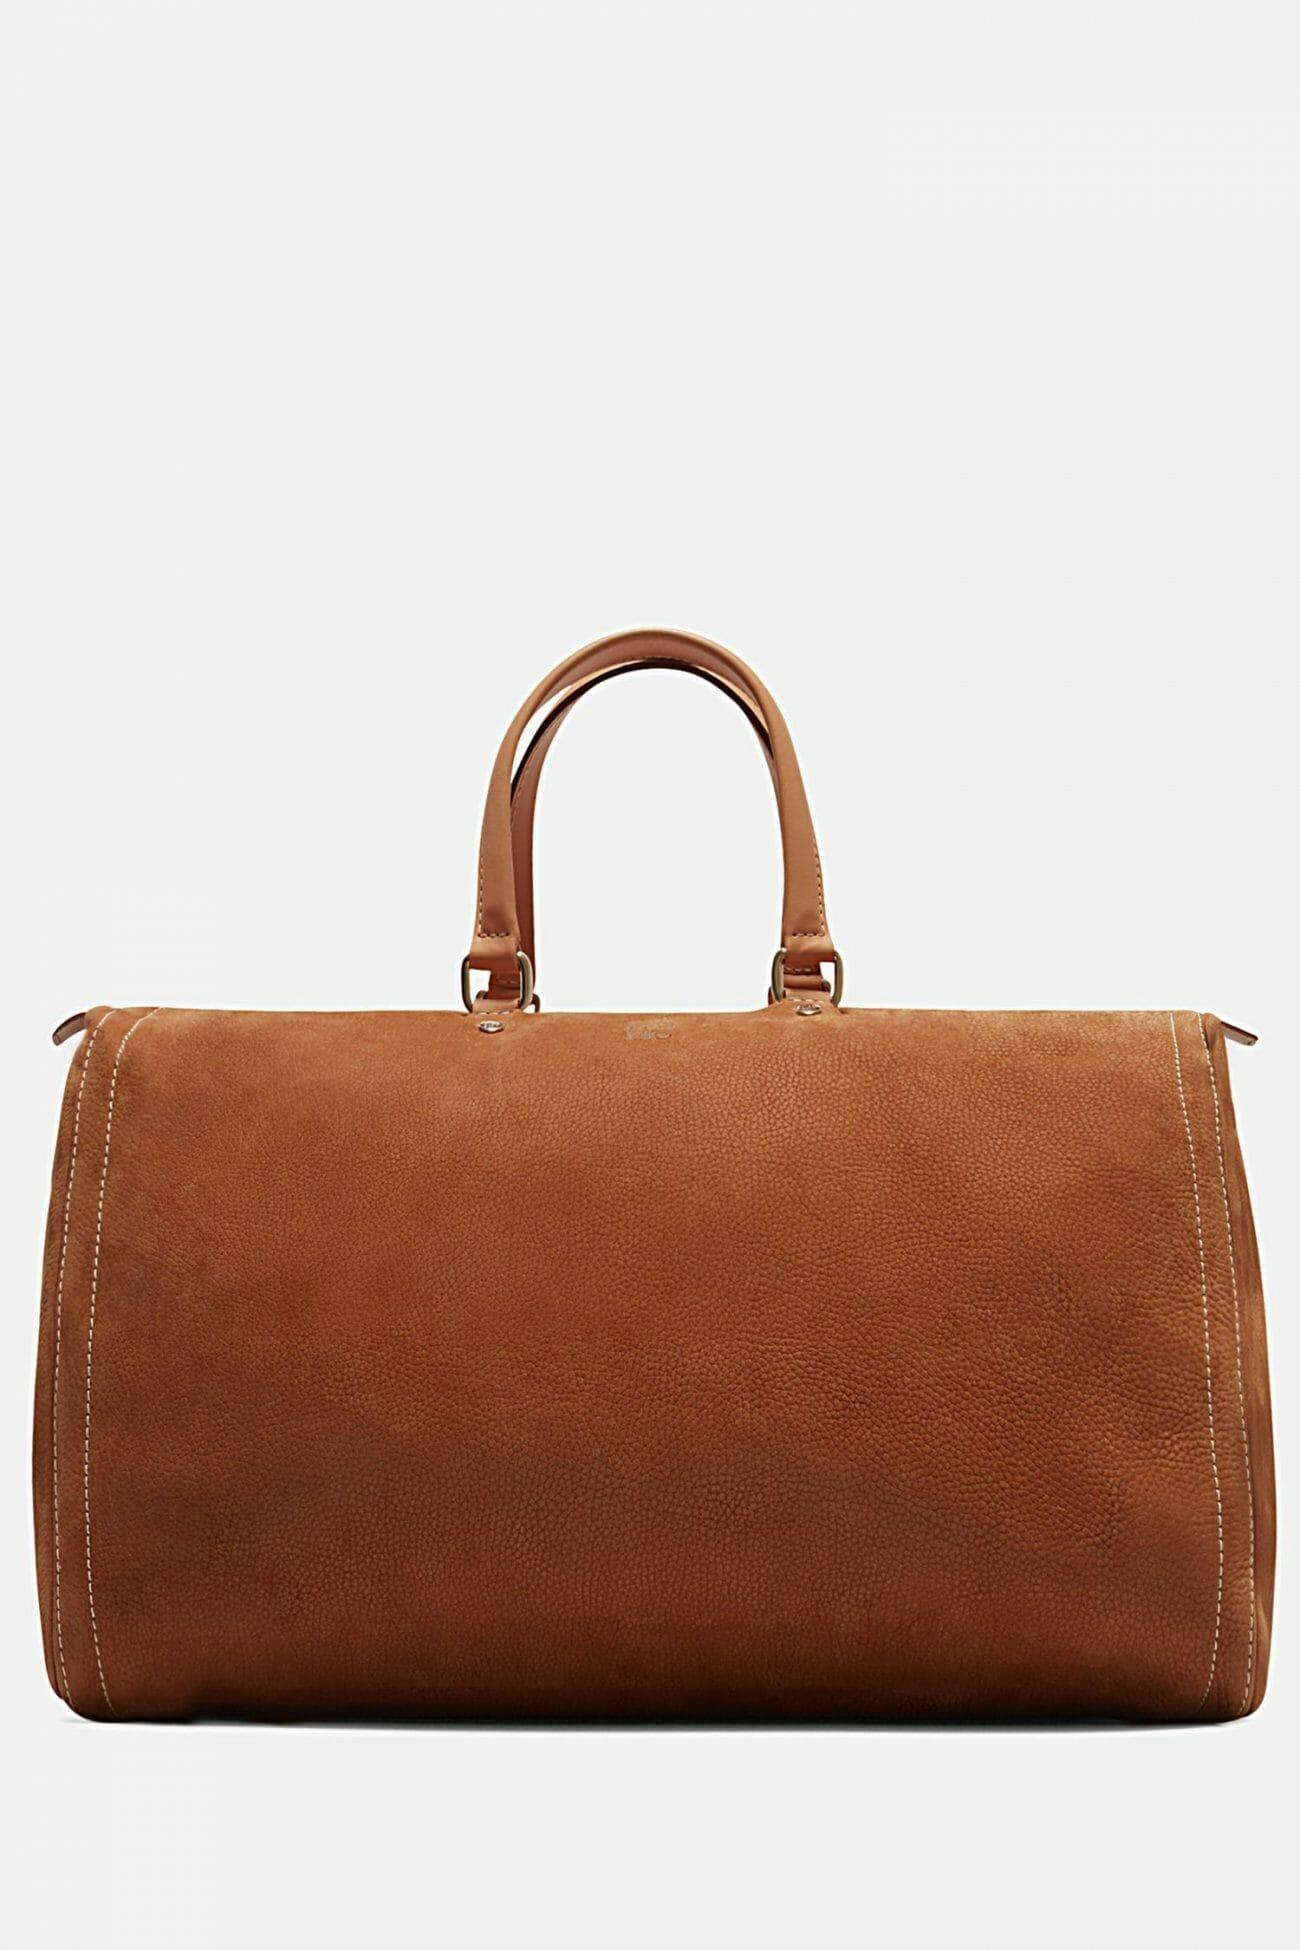 CH-Carolina-herrera-men-accessories-look-26